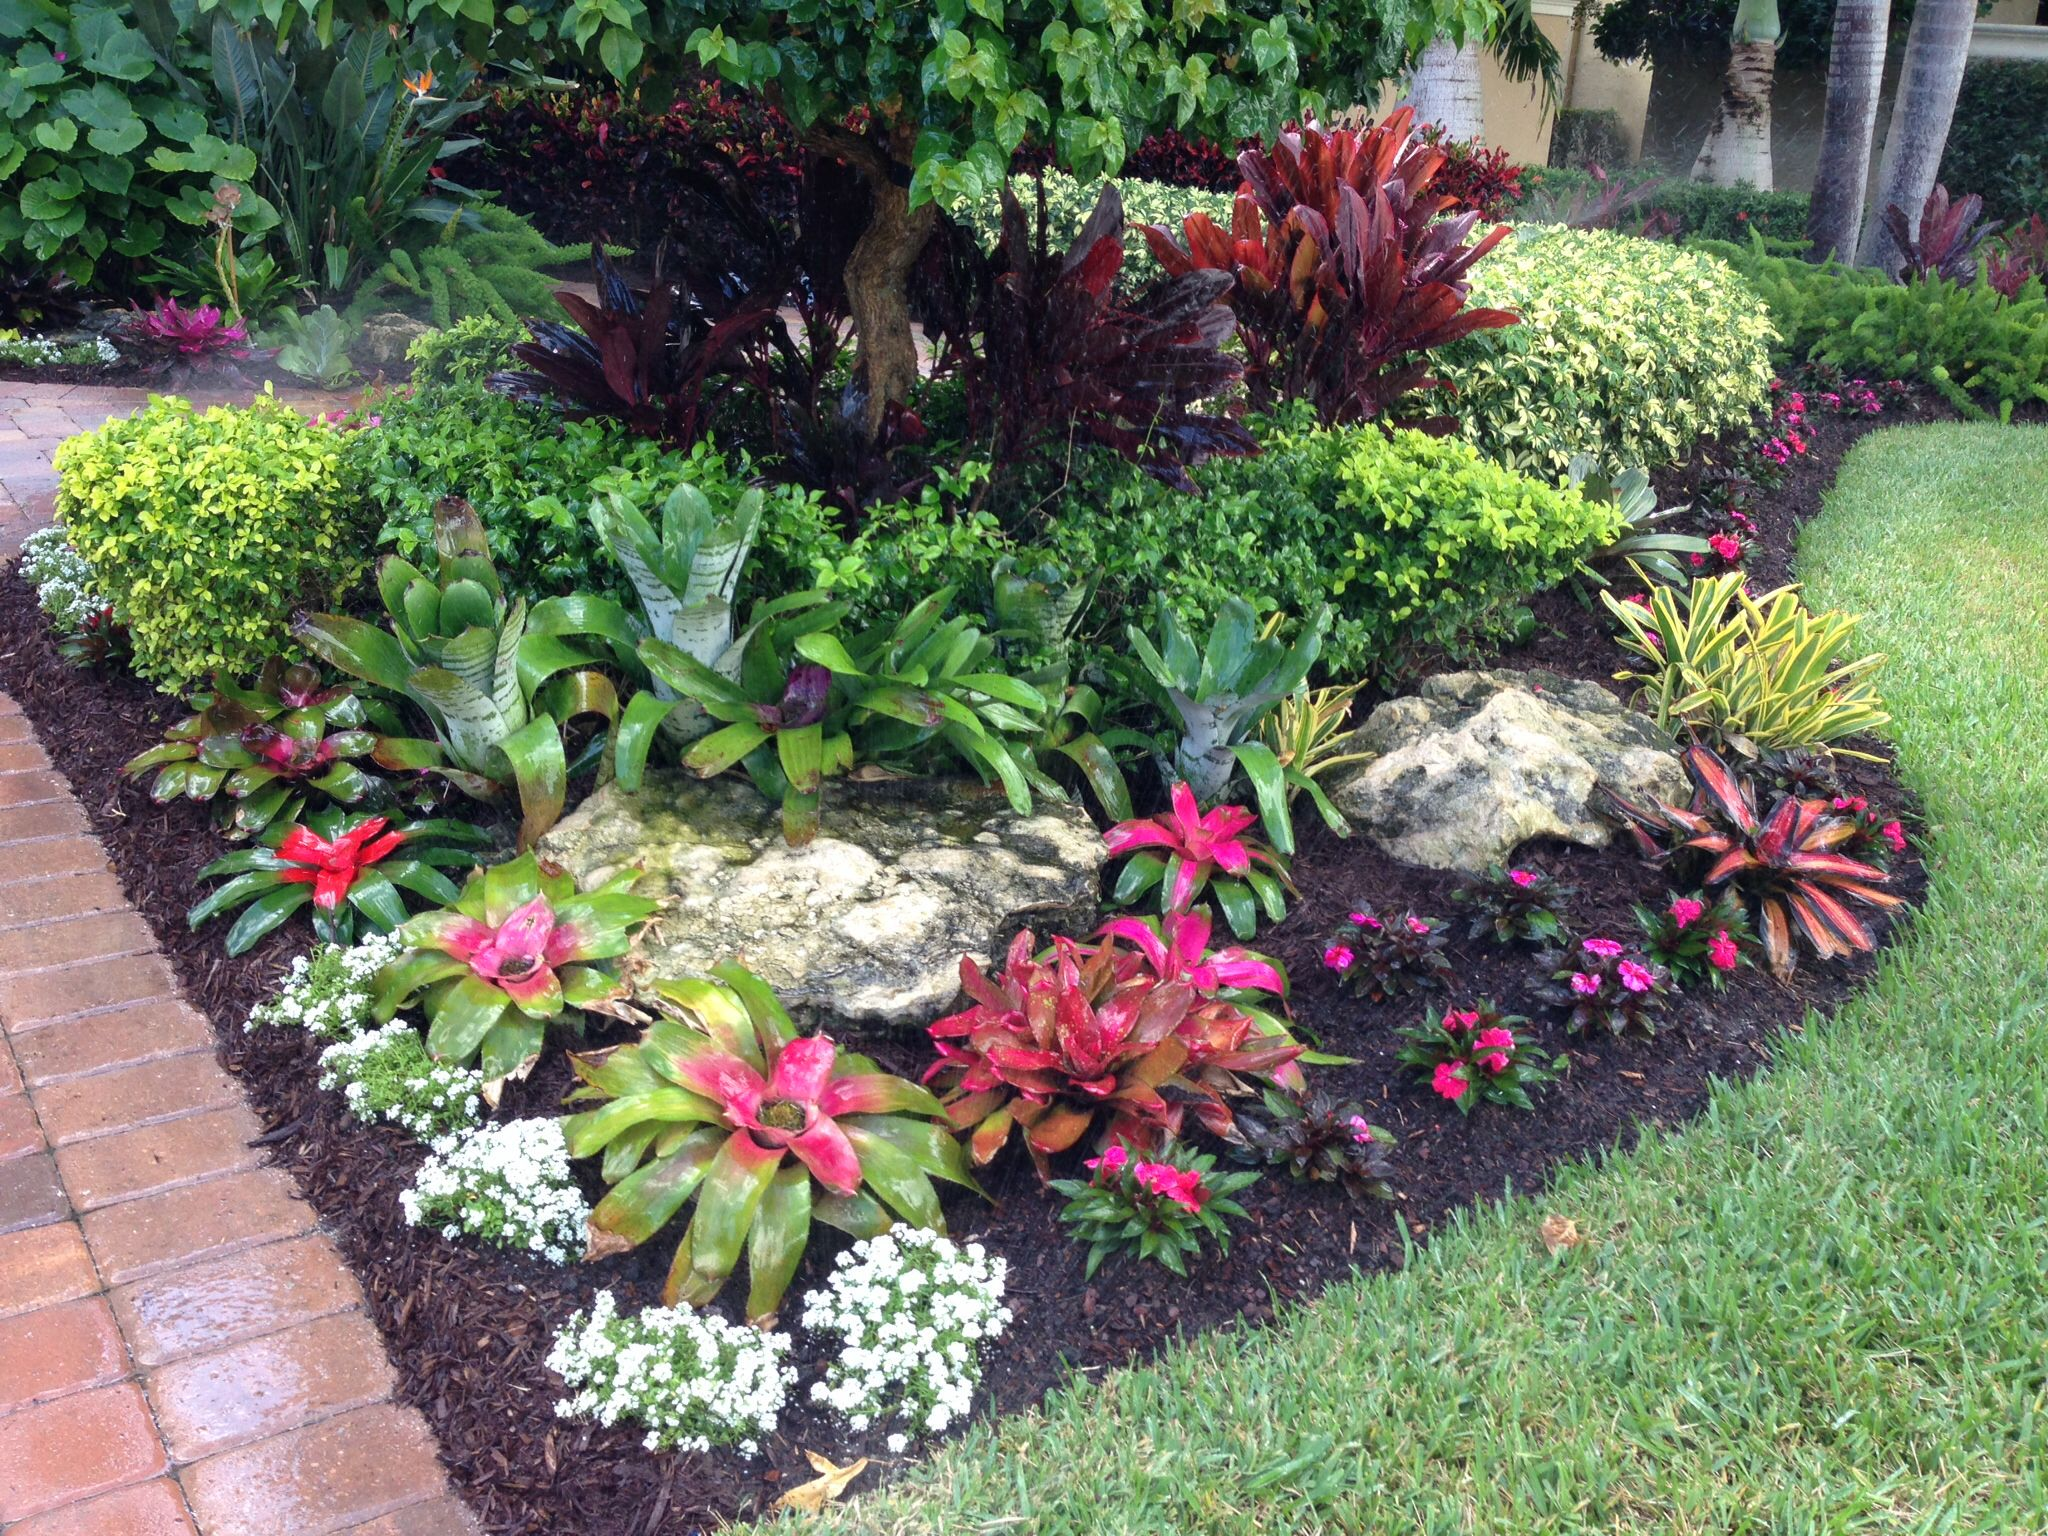 Tropical bromeliad garden design | My Landscape Designs